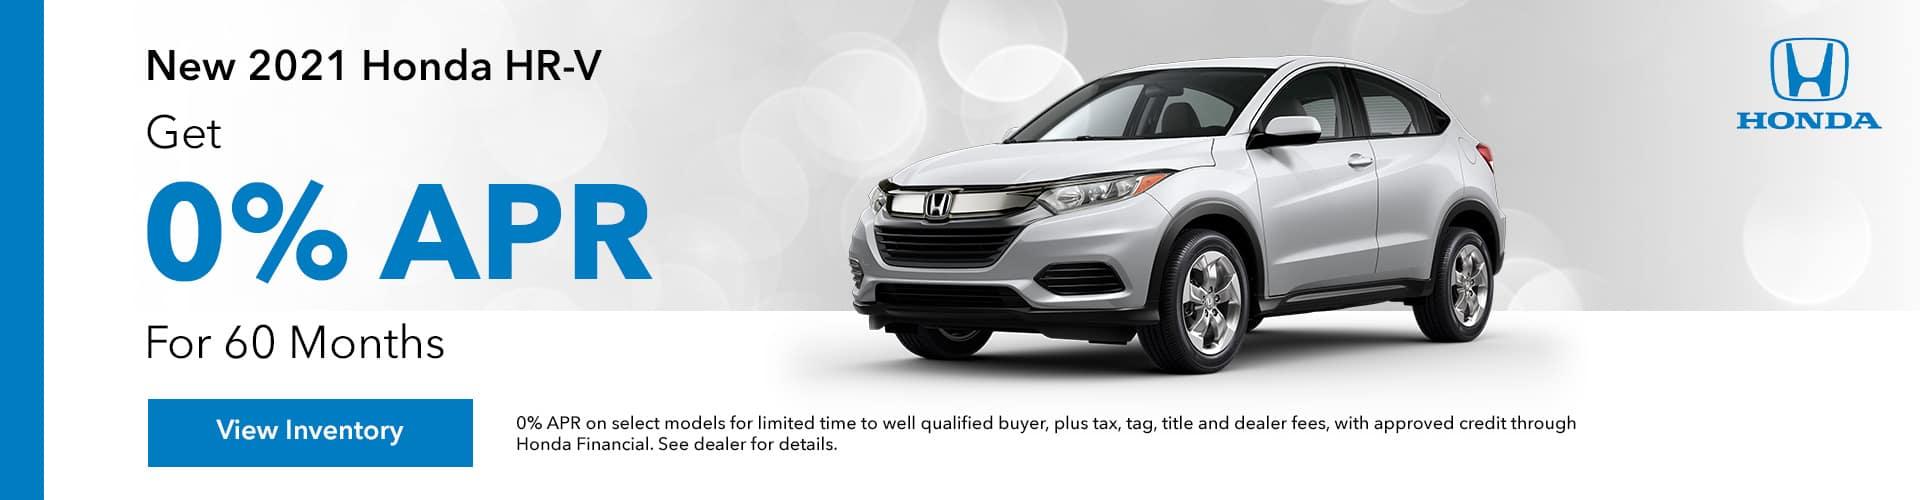 new 2021 Honda HR-V 0% APR, Get 0% APR For up to 60 Months